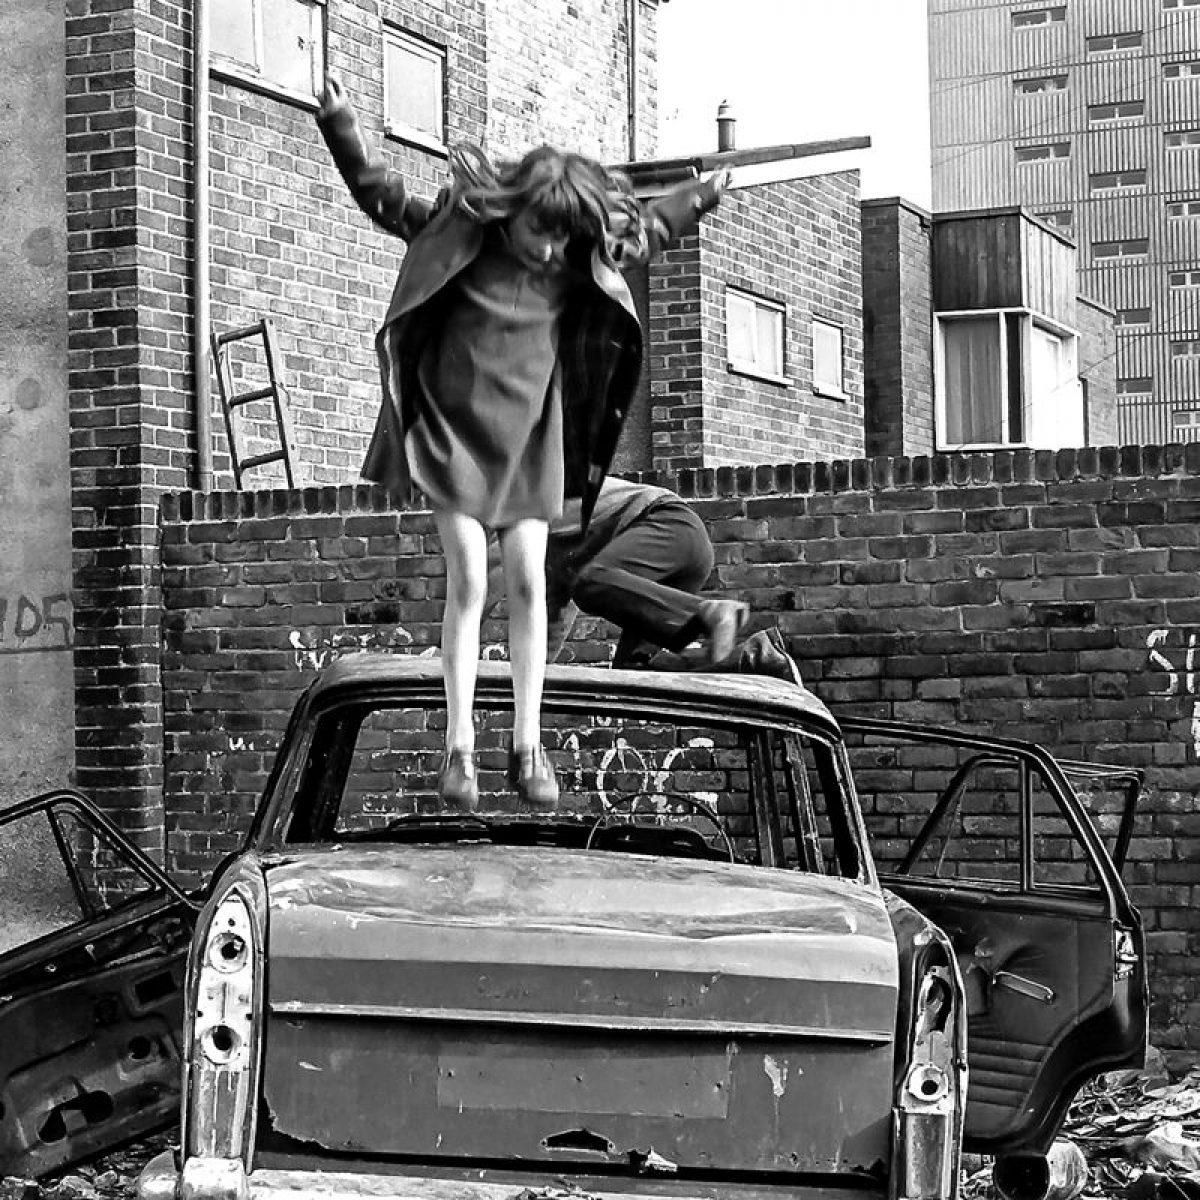 SuperMac - Elswick Kids (1978)